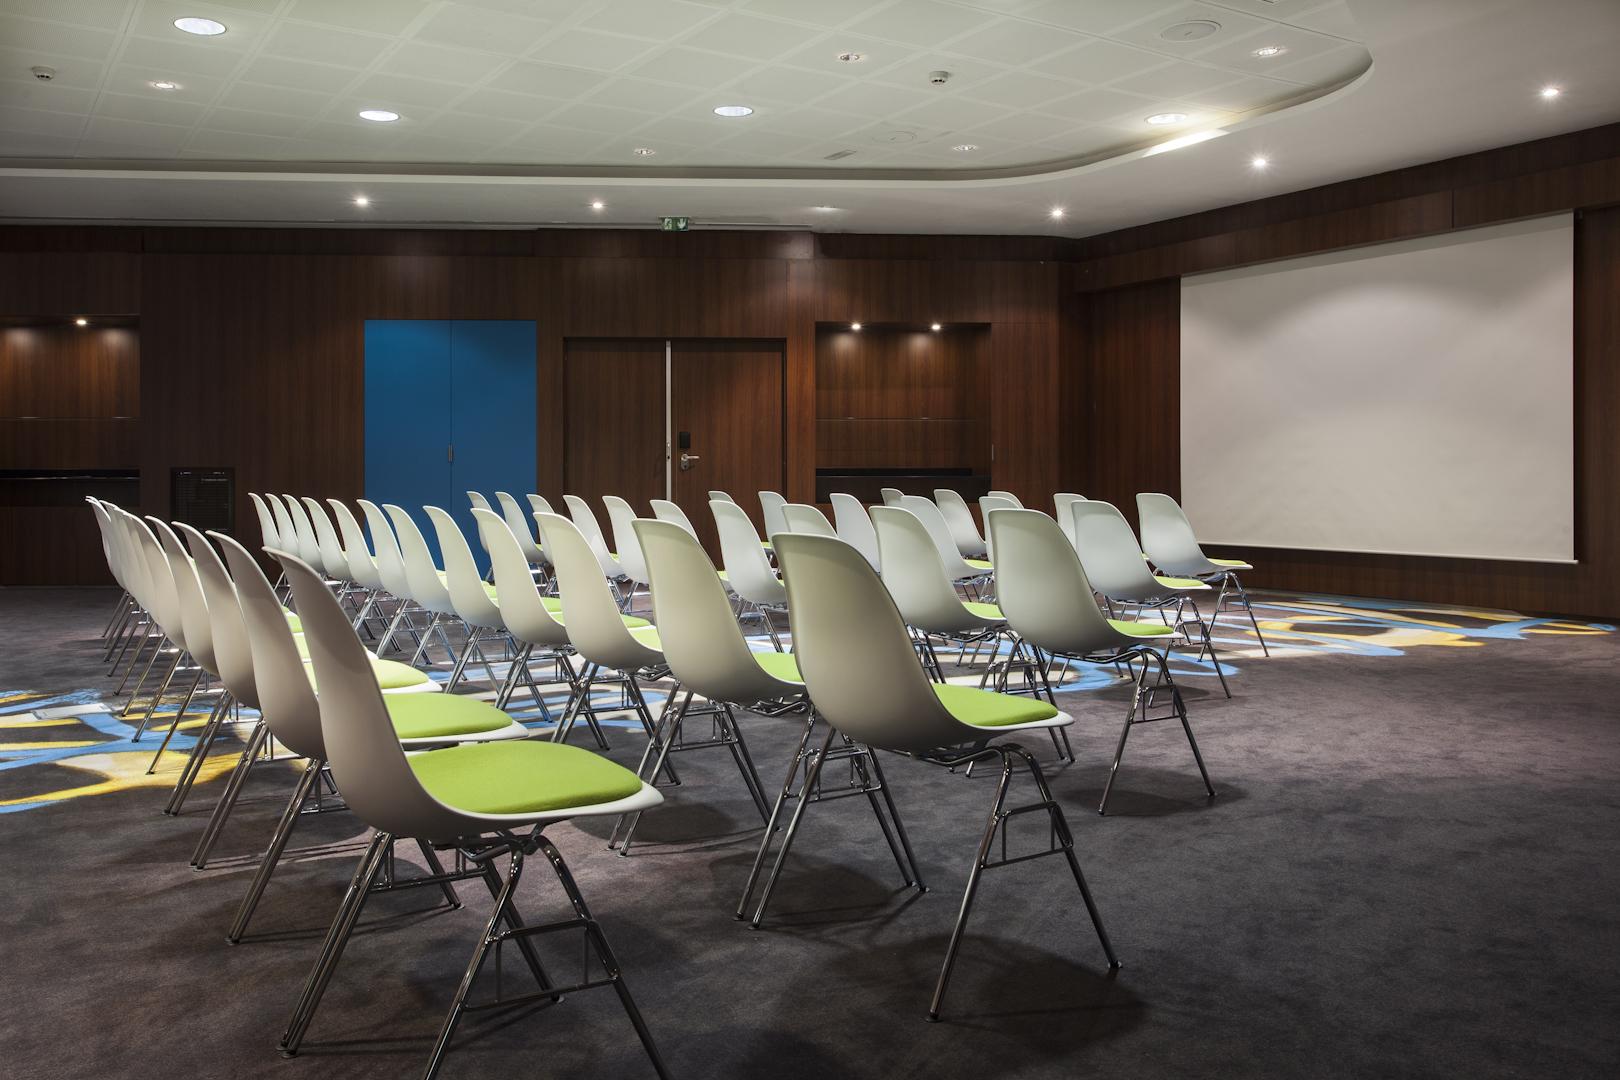 Salle de Conférence © Alexandre Soria